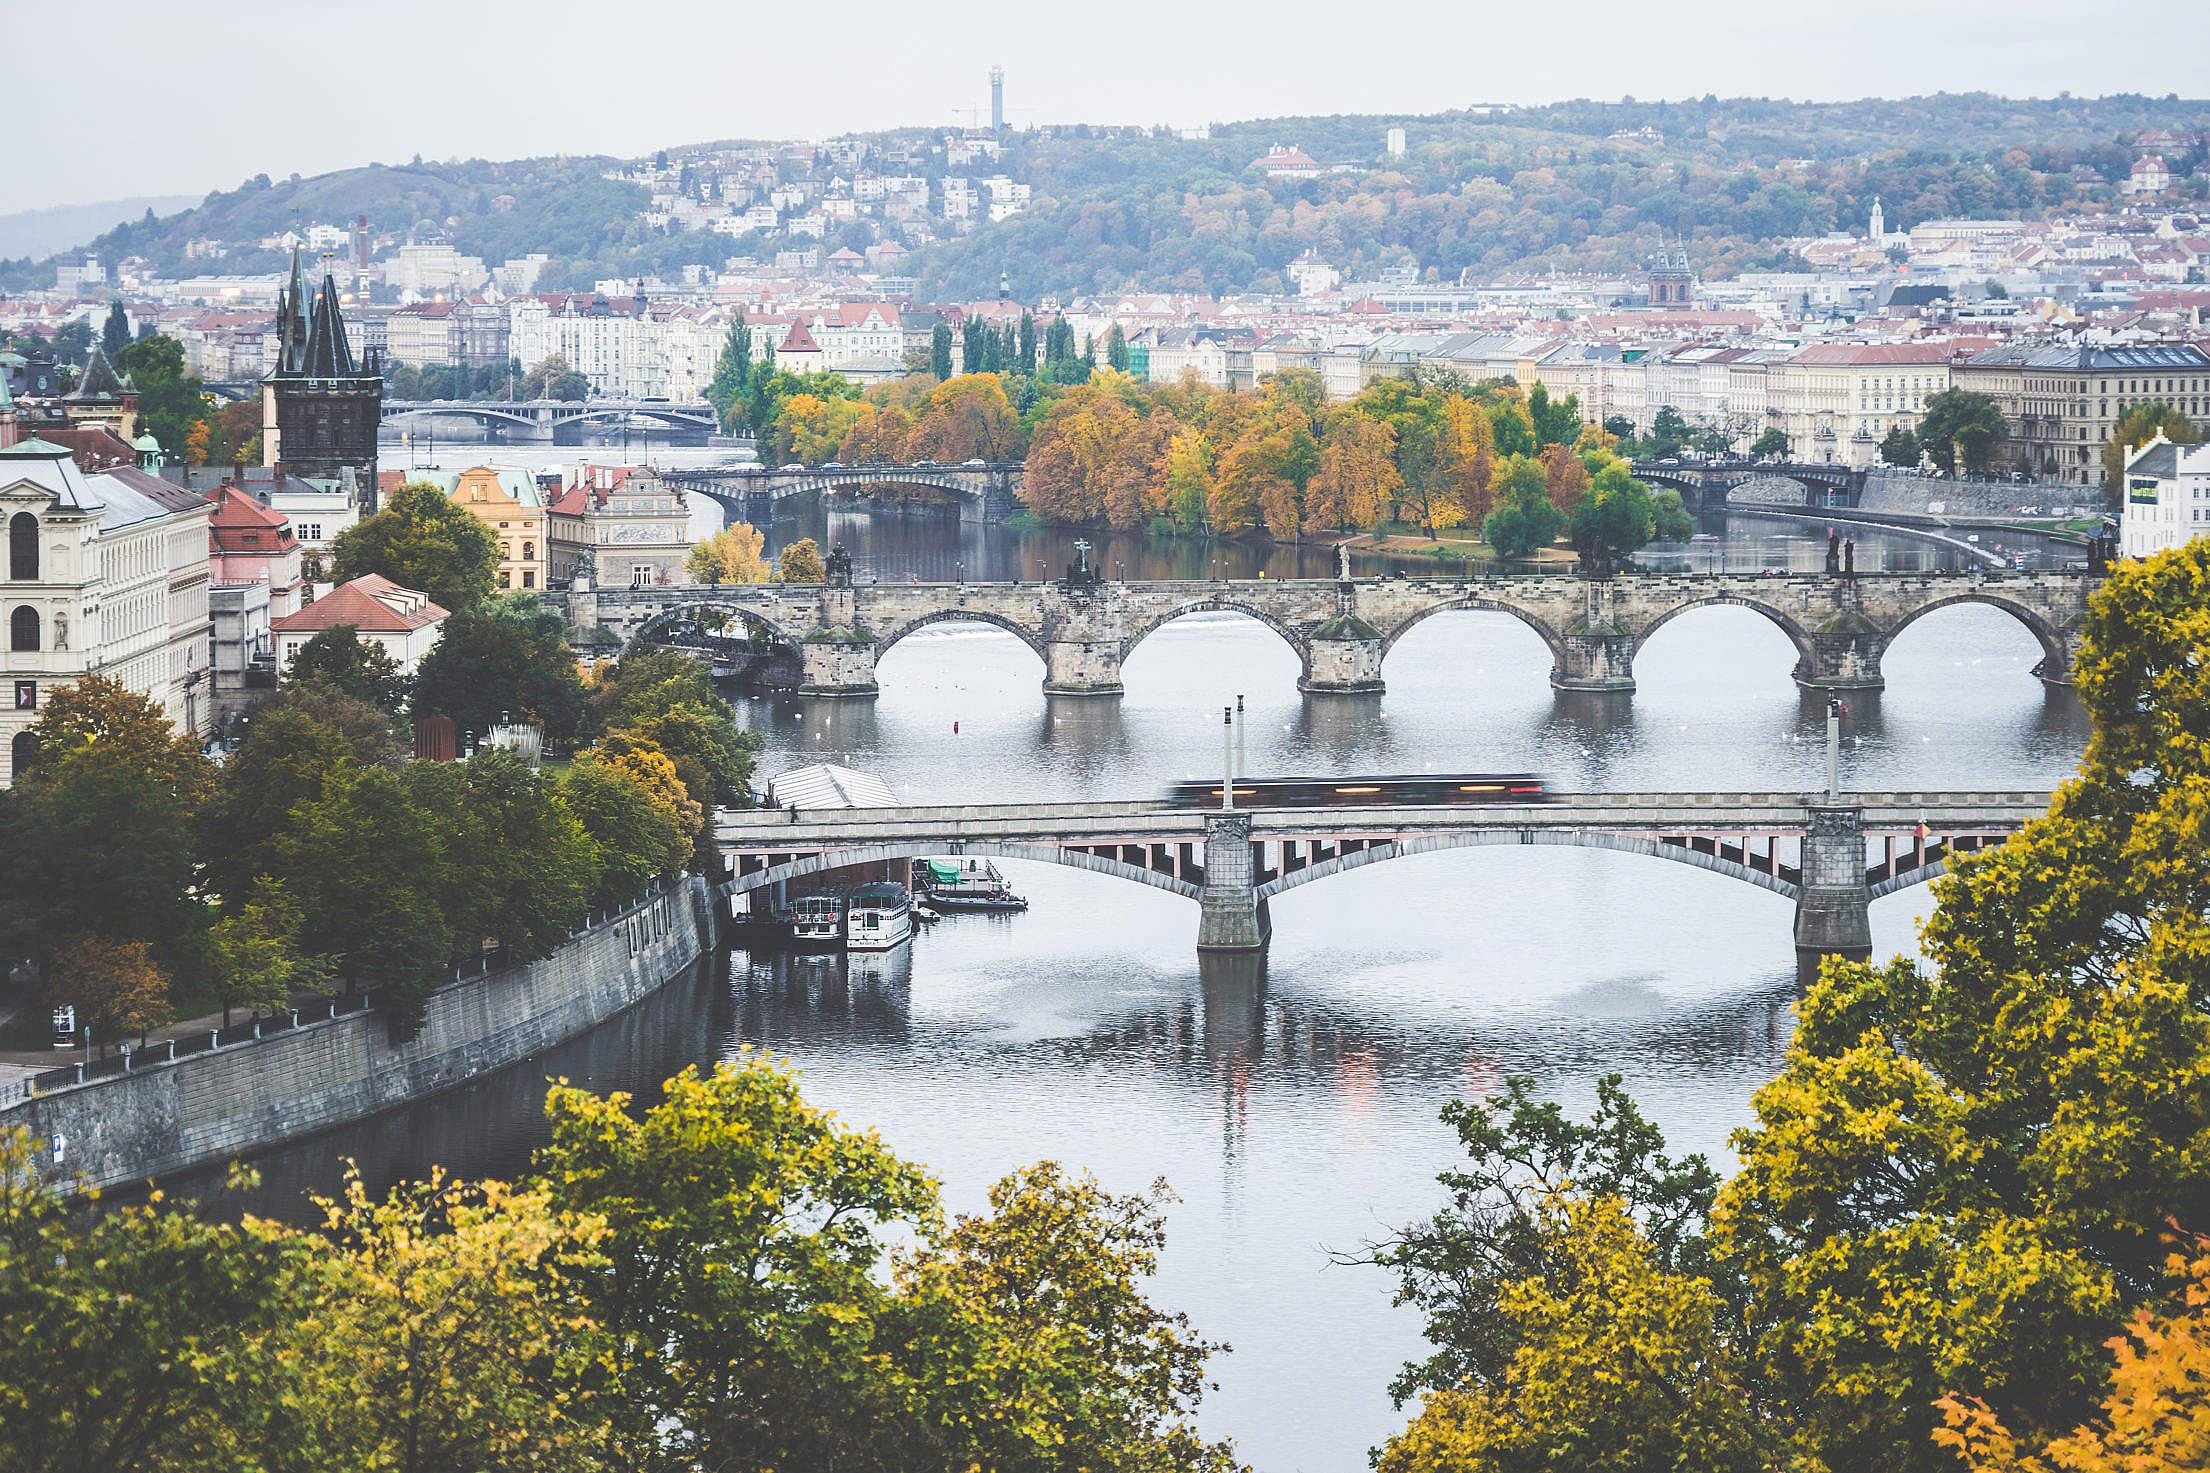 Old Prague Bridges in Autumn Morning Free Stock Photo